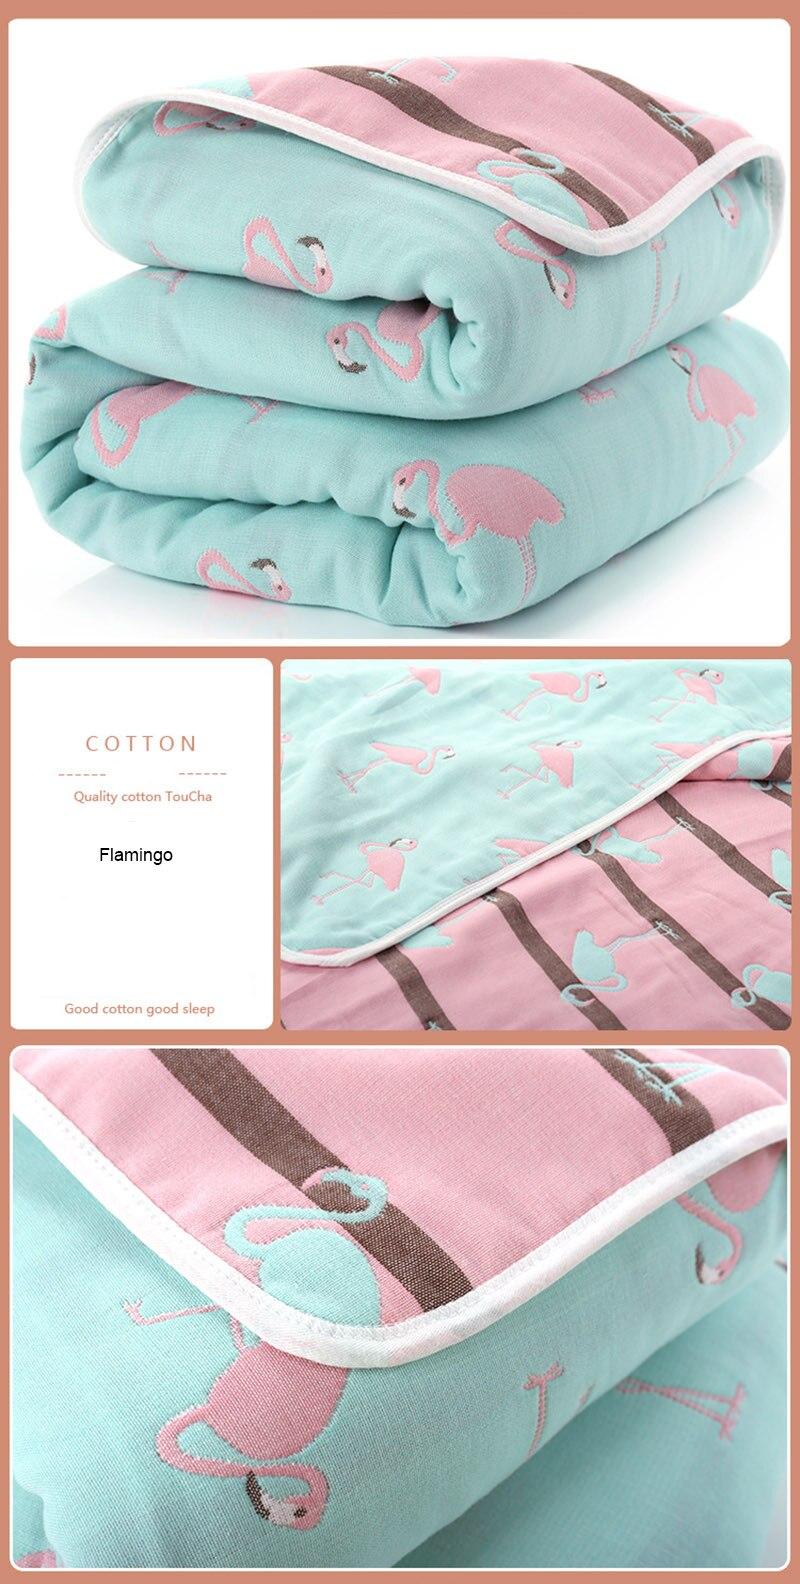 details- Flamingo